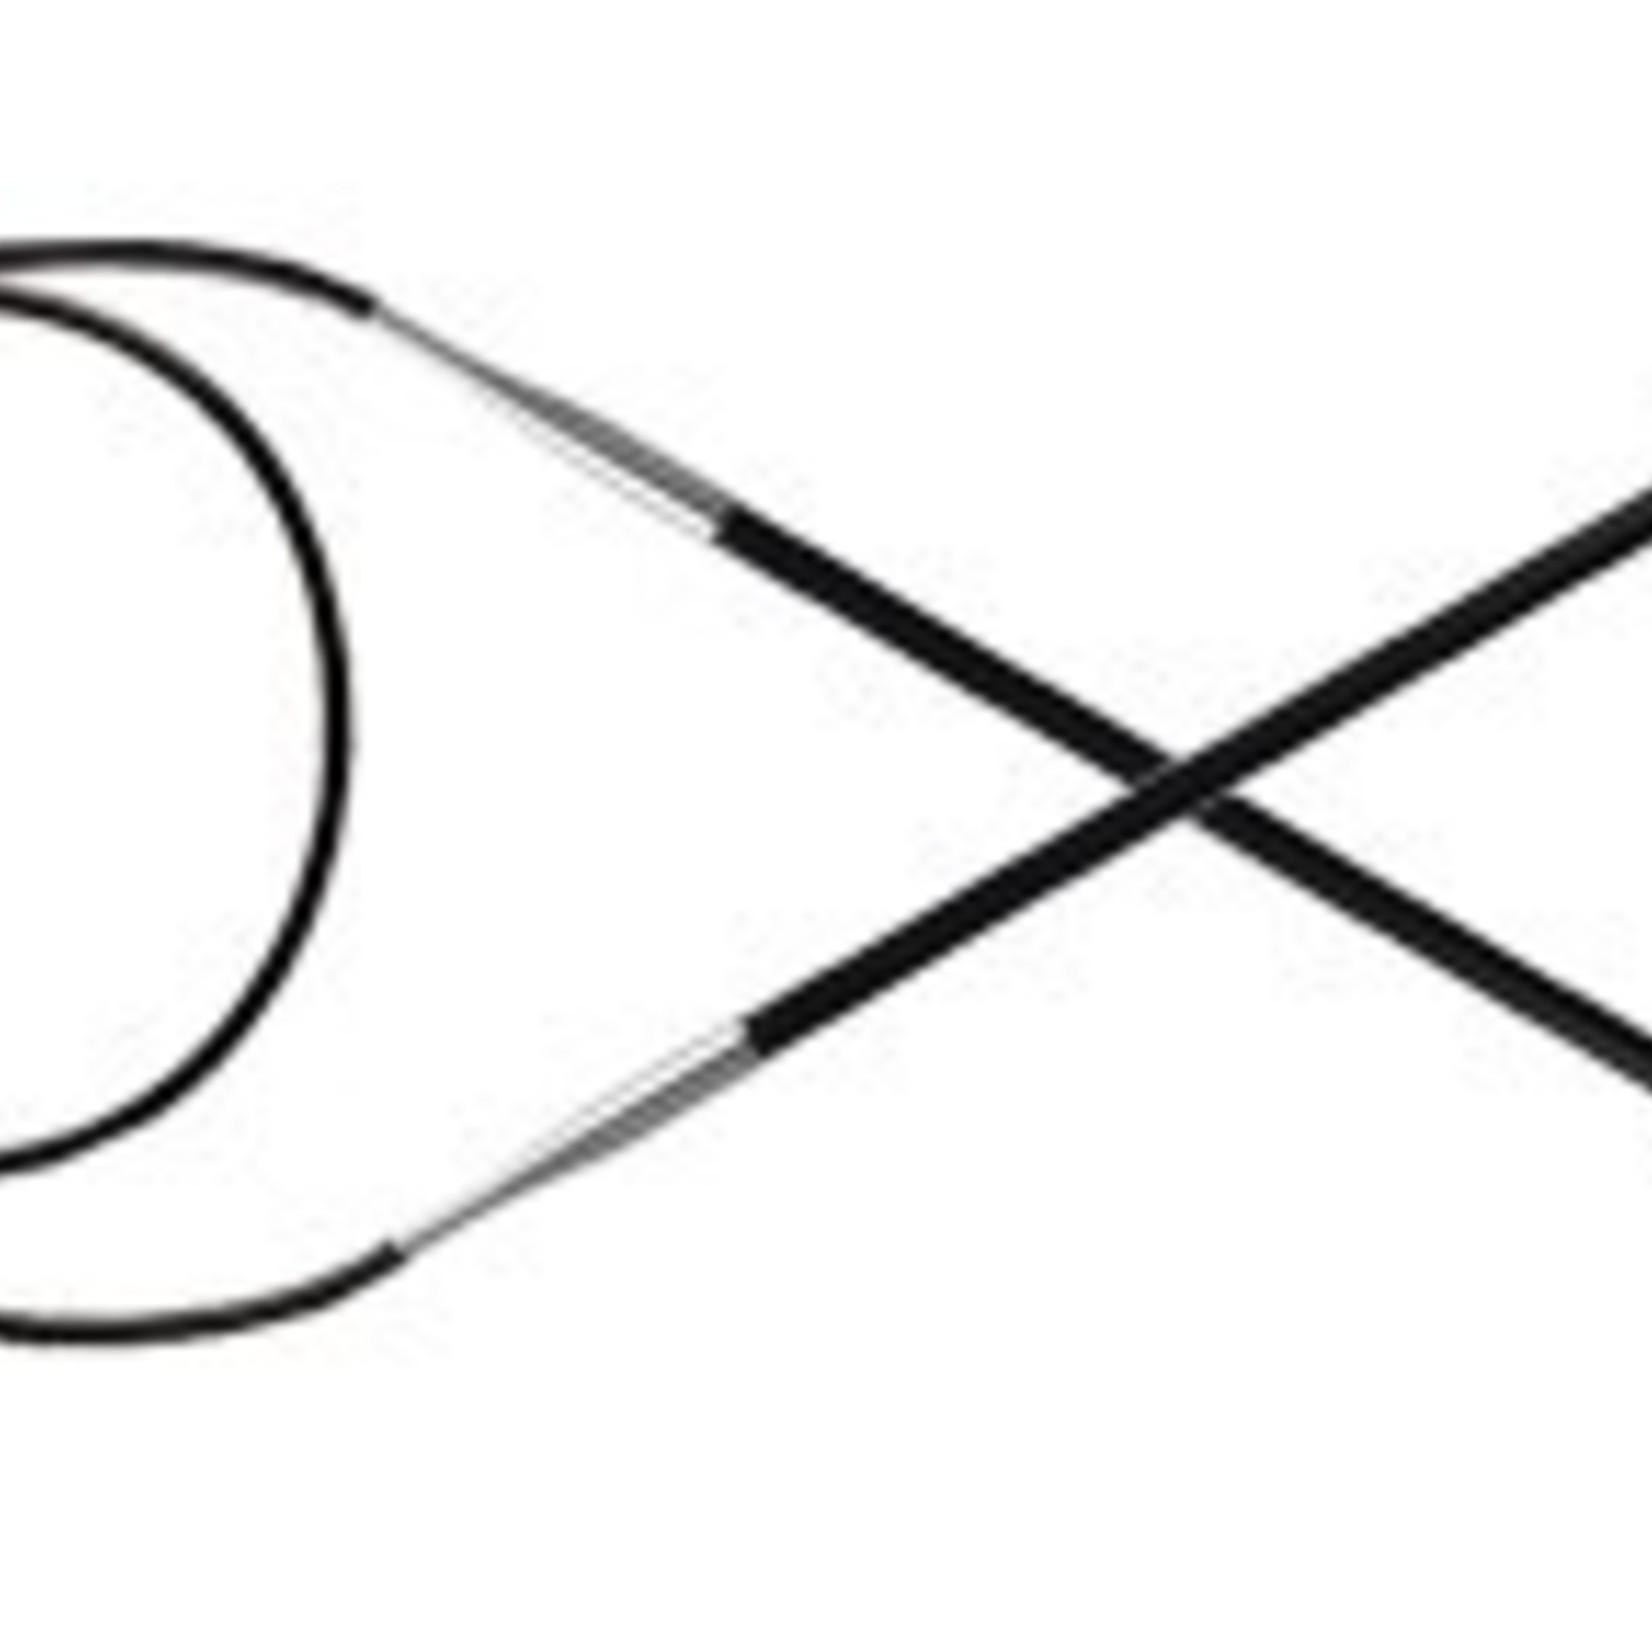 Knitter's Pride 10.5 Karbonz Circular 40